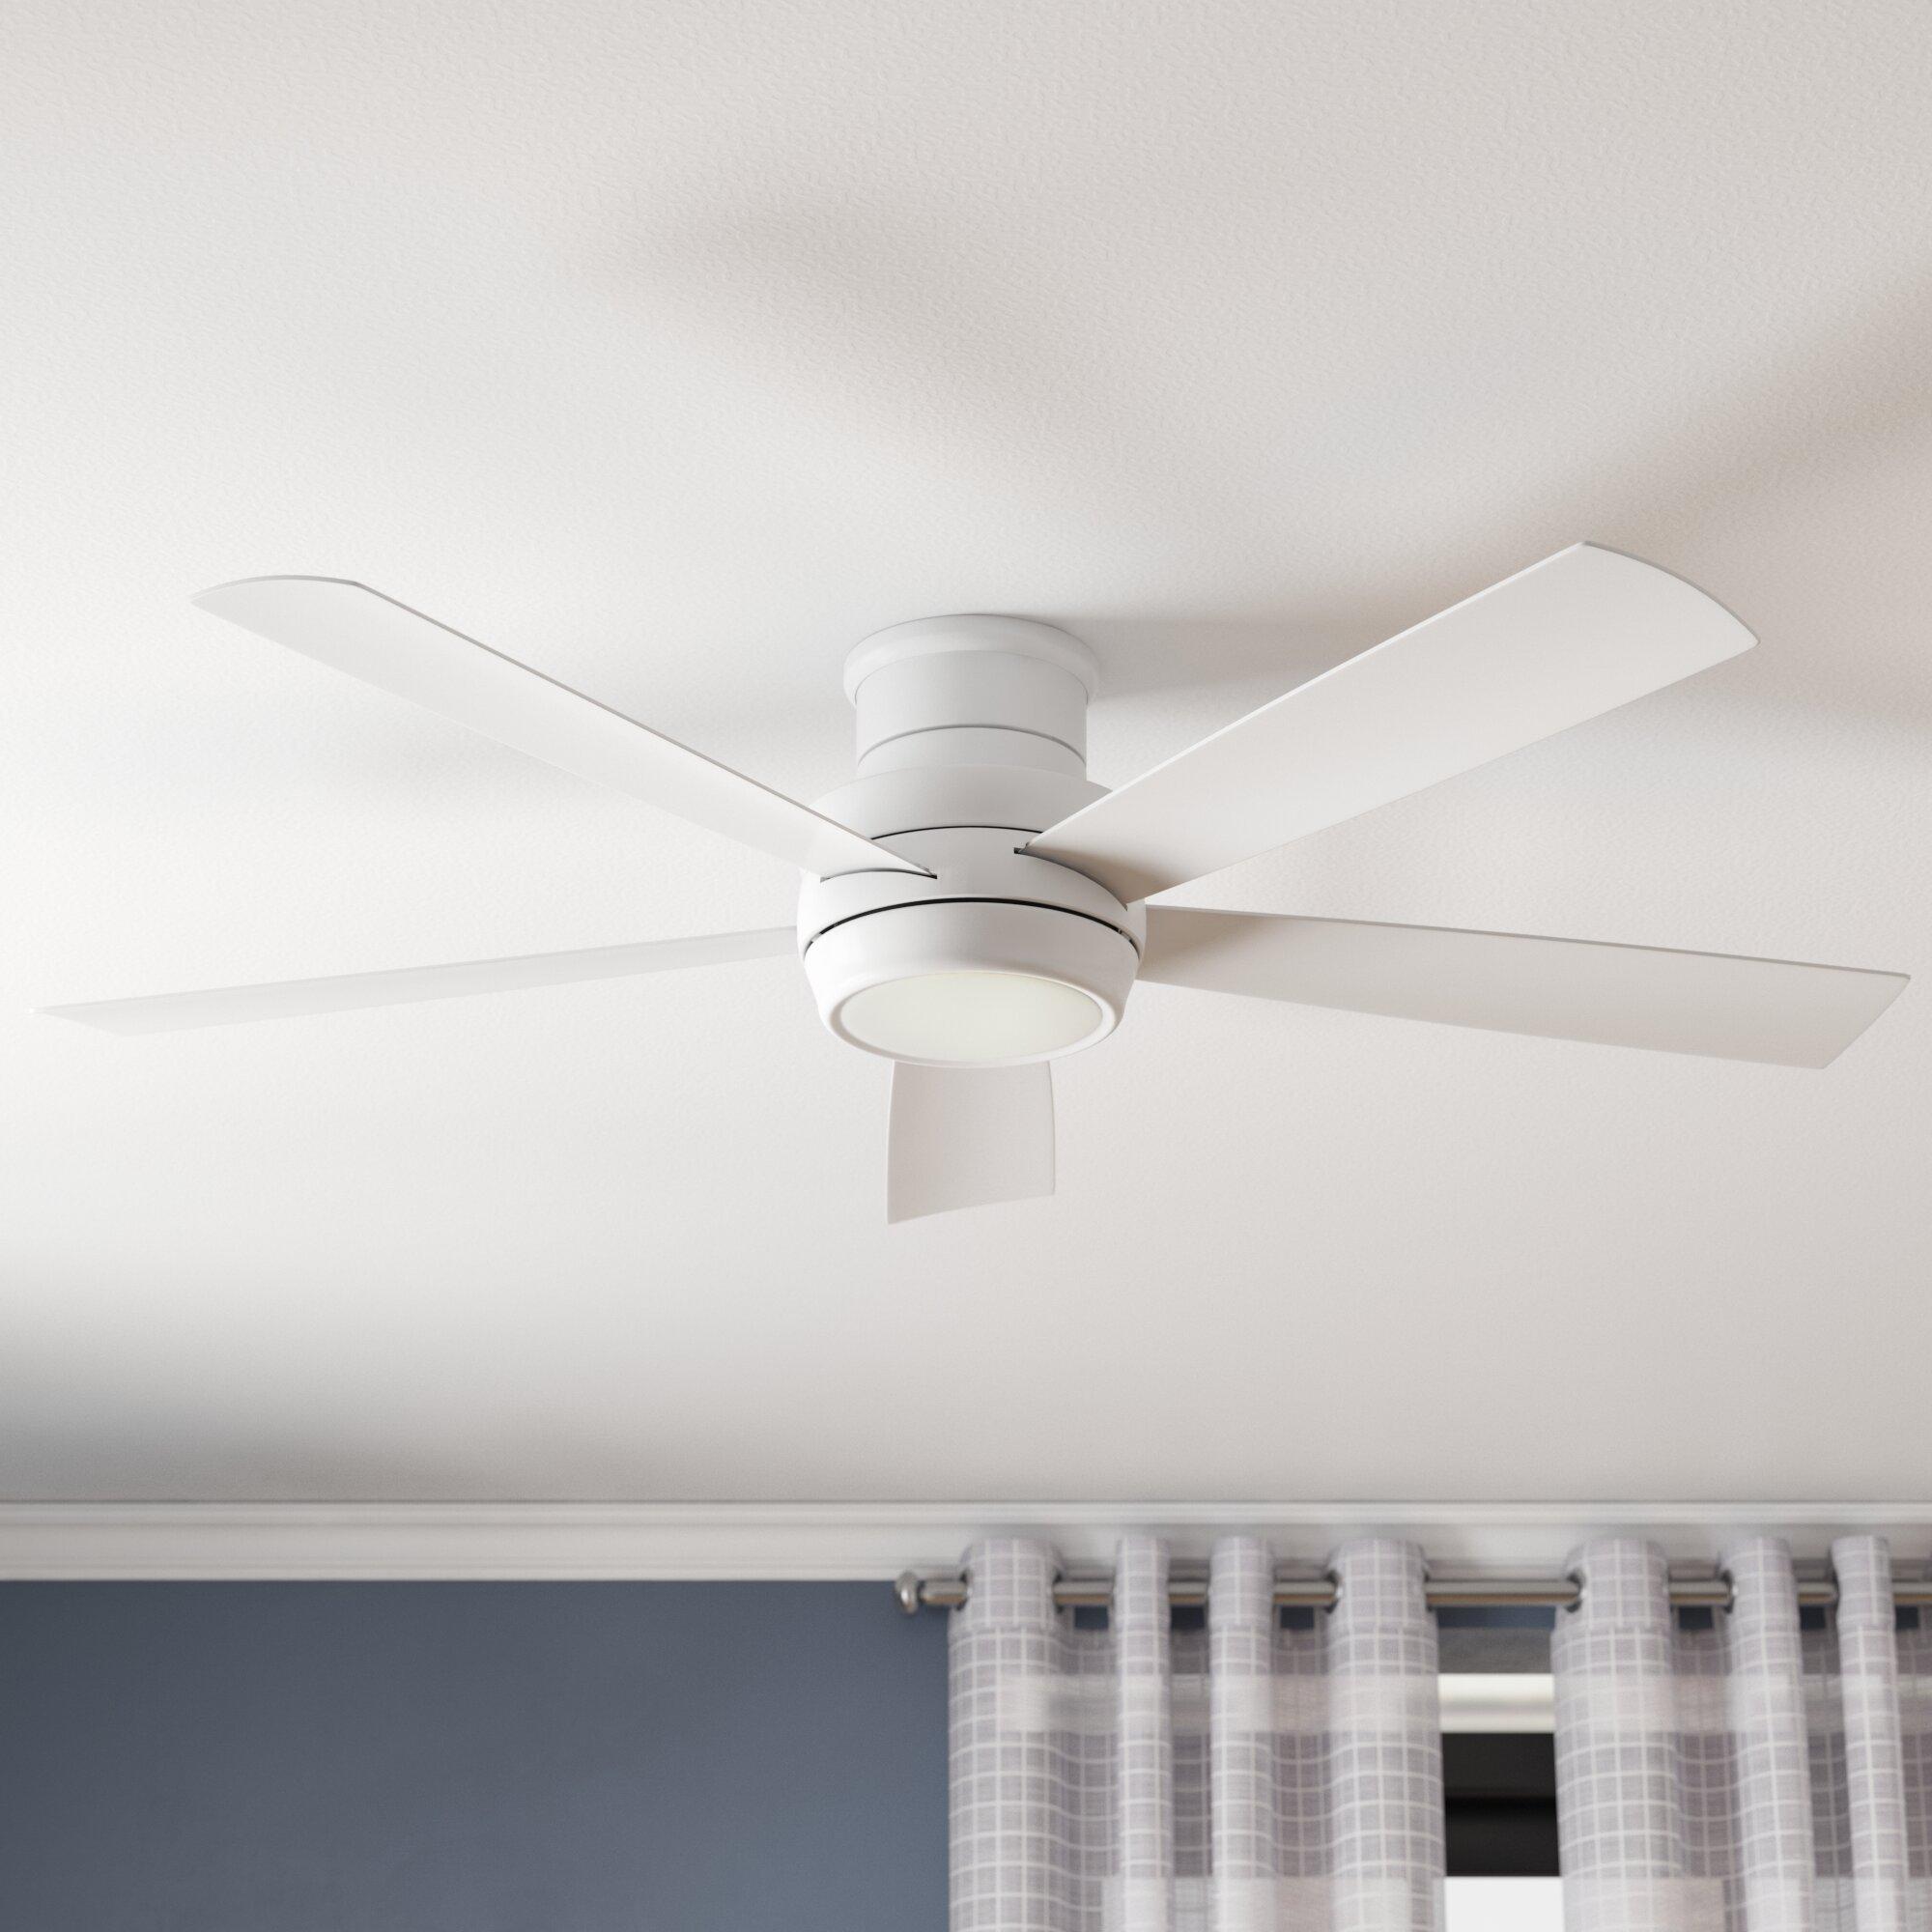 Image of: White Ceiling Fan With Light Kit Hugger 52 In Indoor Led 5 Blades Flush Mount